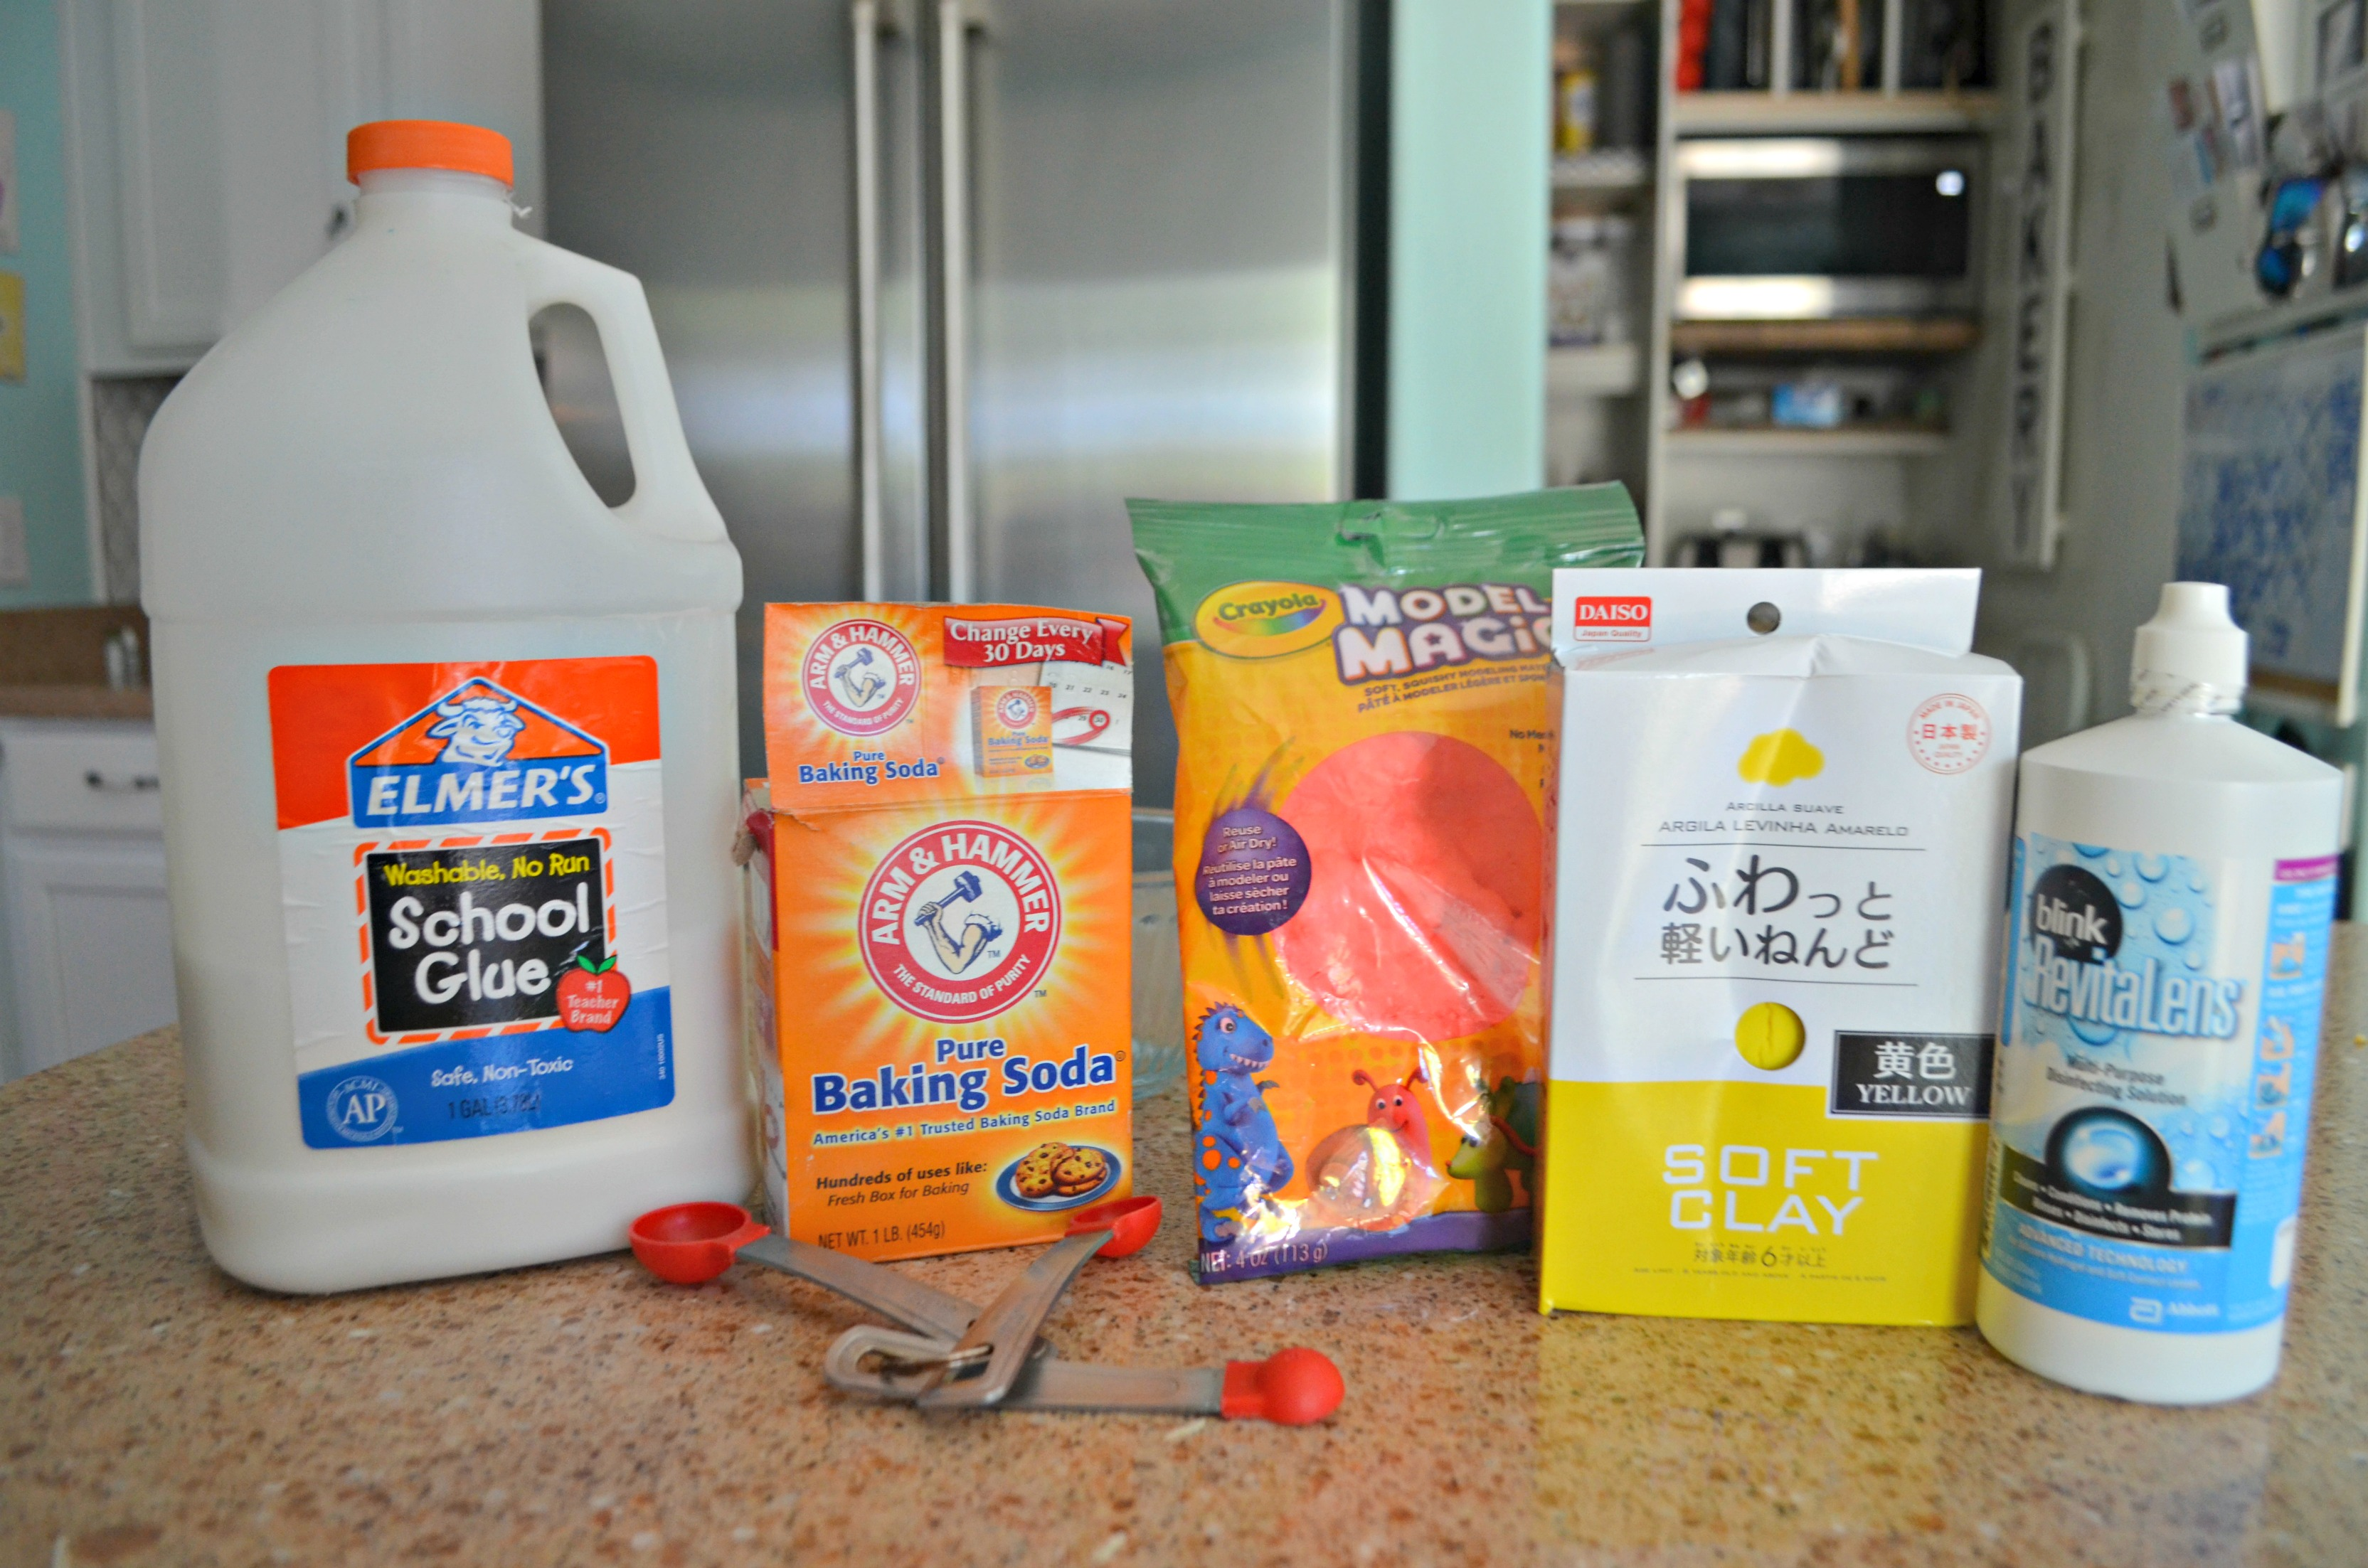 Make diy butter slime using clay – Ingredients